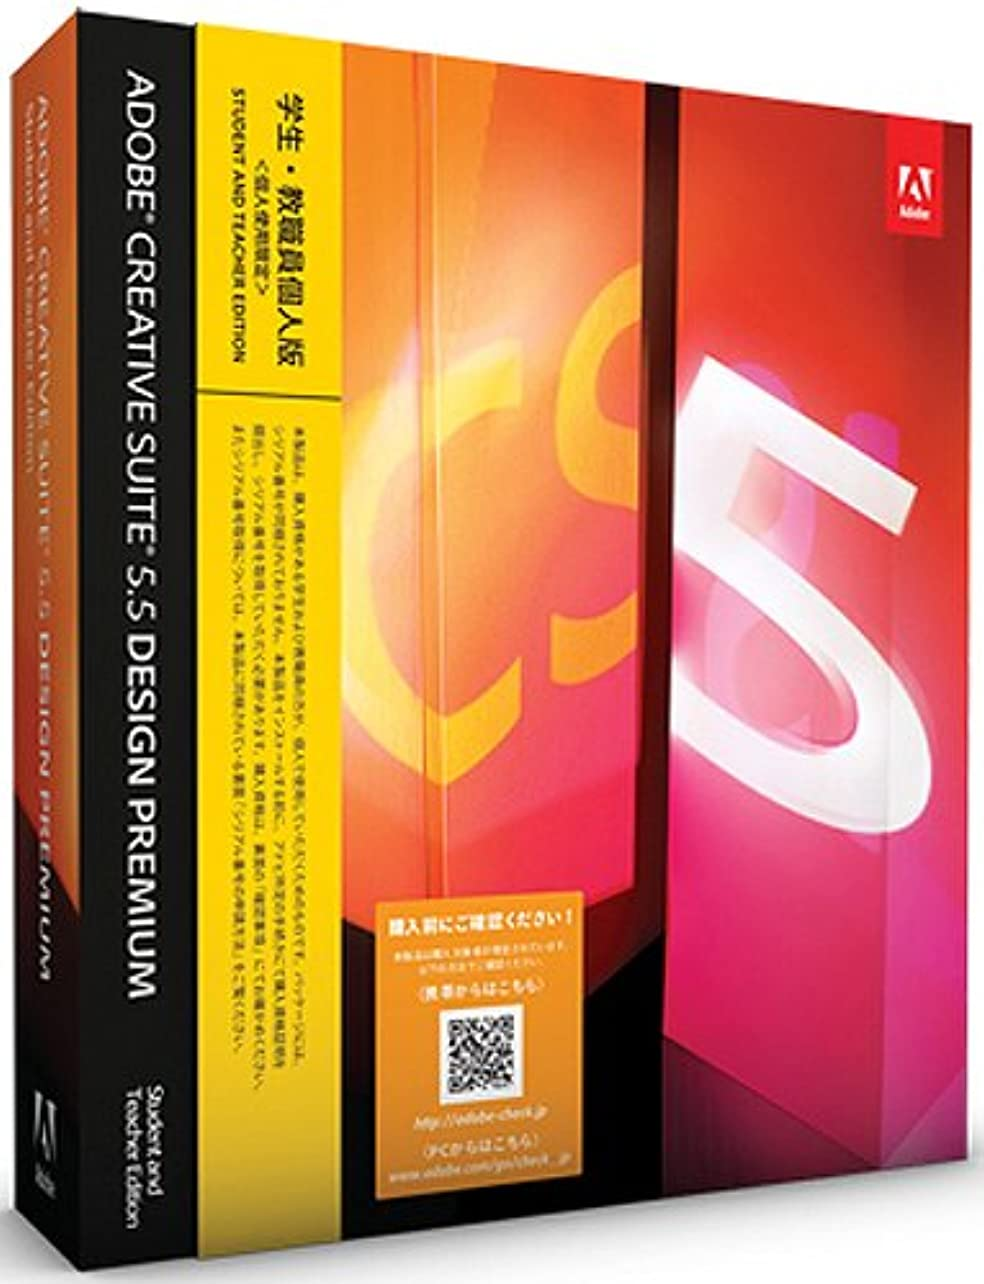 ヤギ女王悲観主義者学生?教職員個人版 Adobe Creative Suite 5.5 Design Premium Windows版 (要シリアル番号申請)